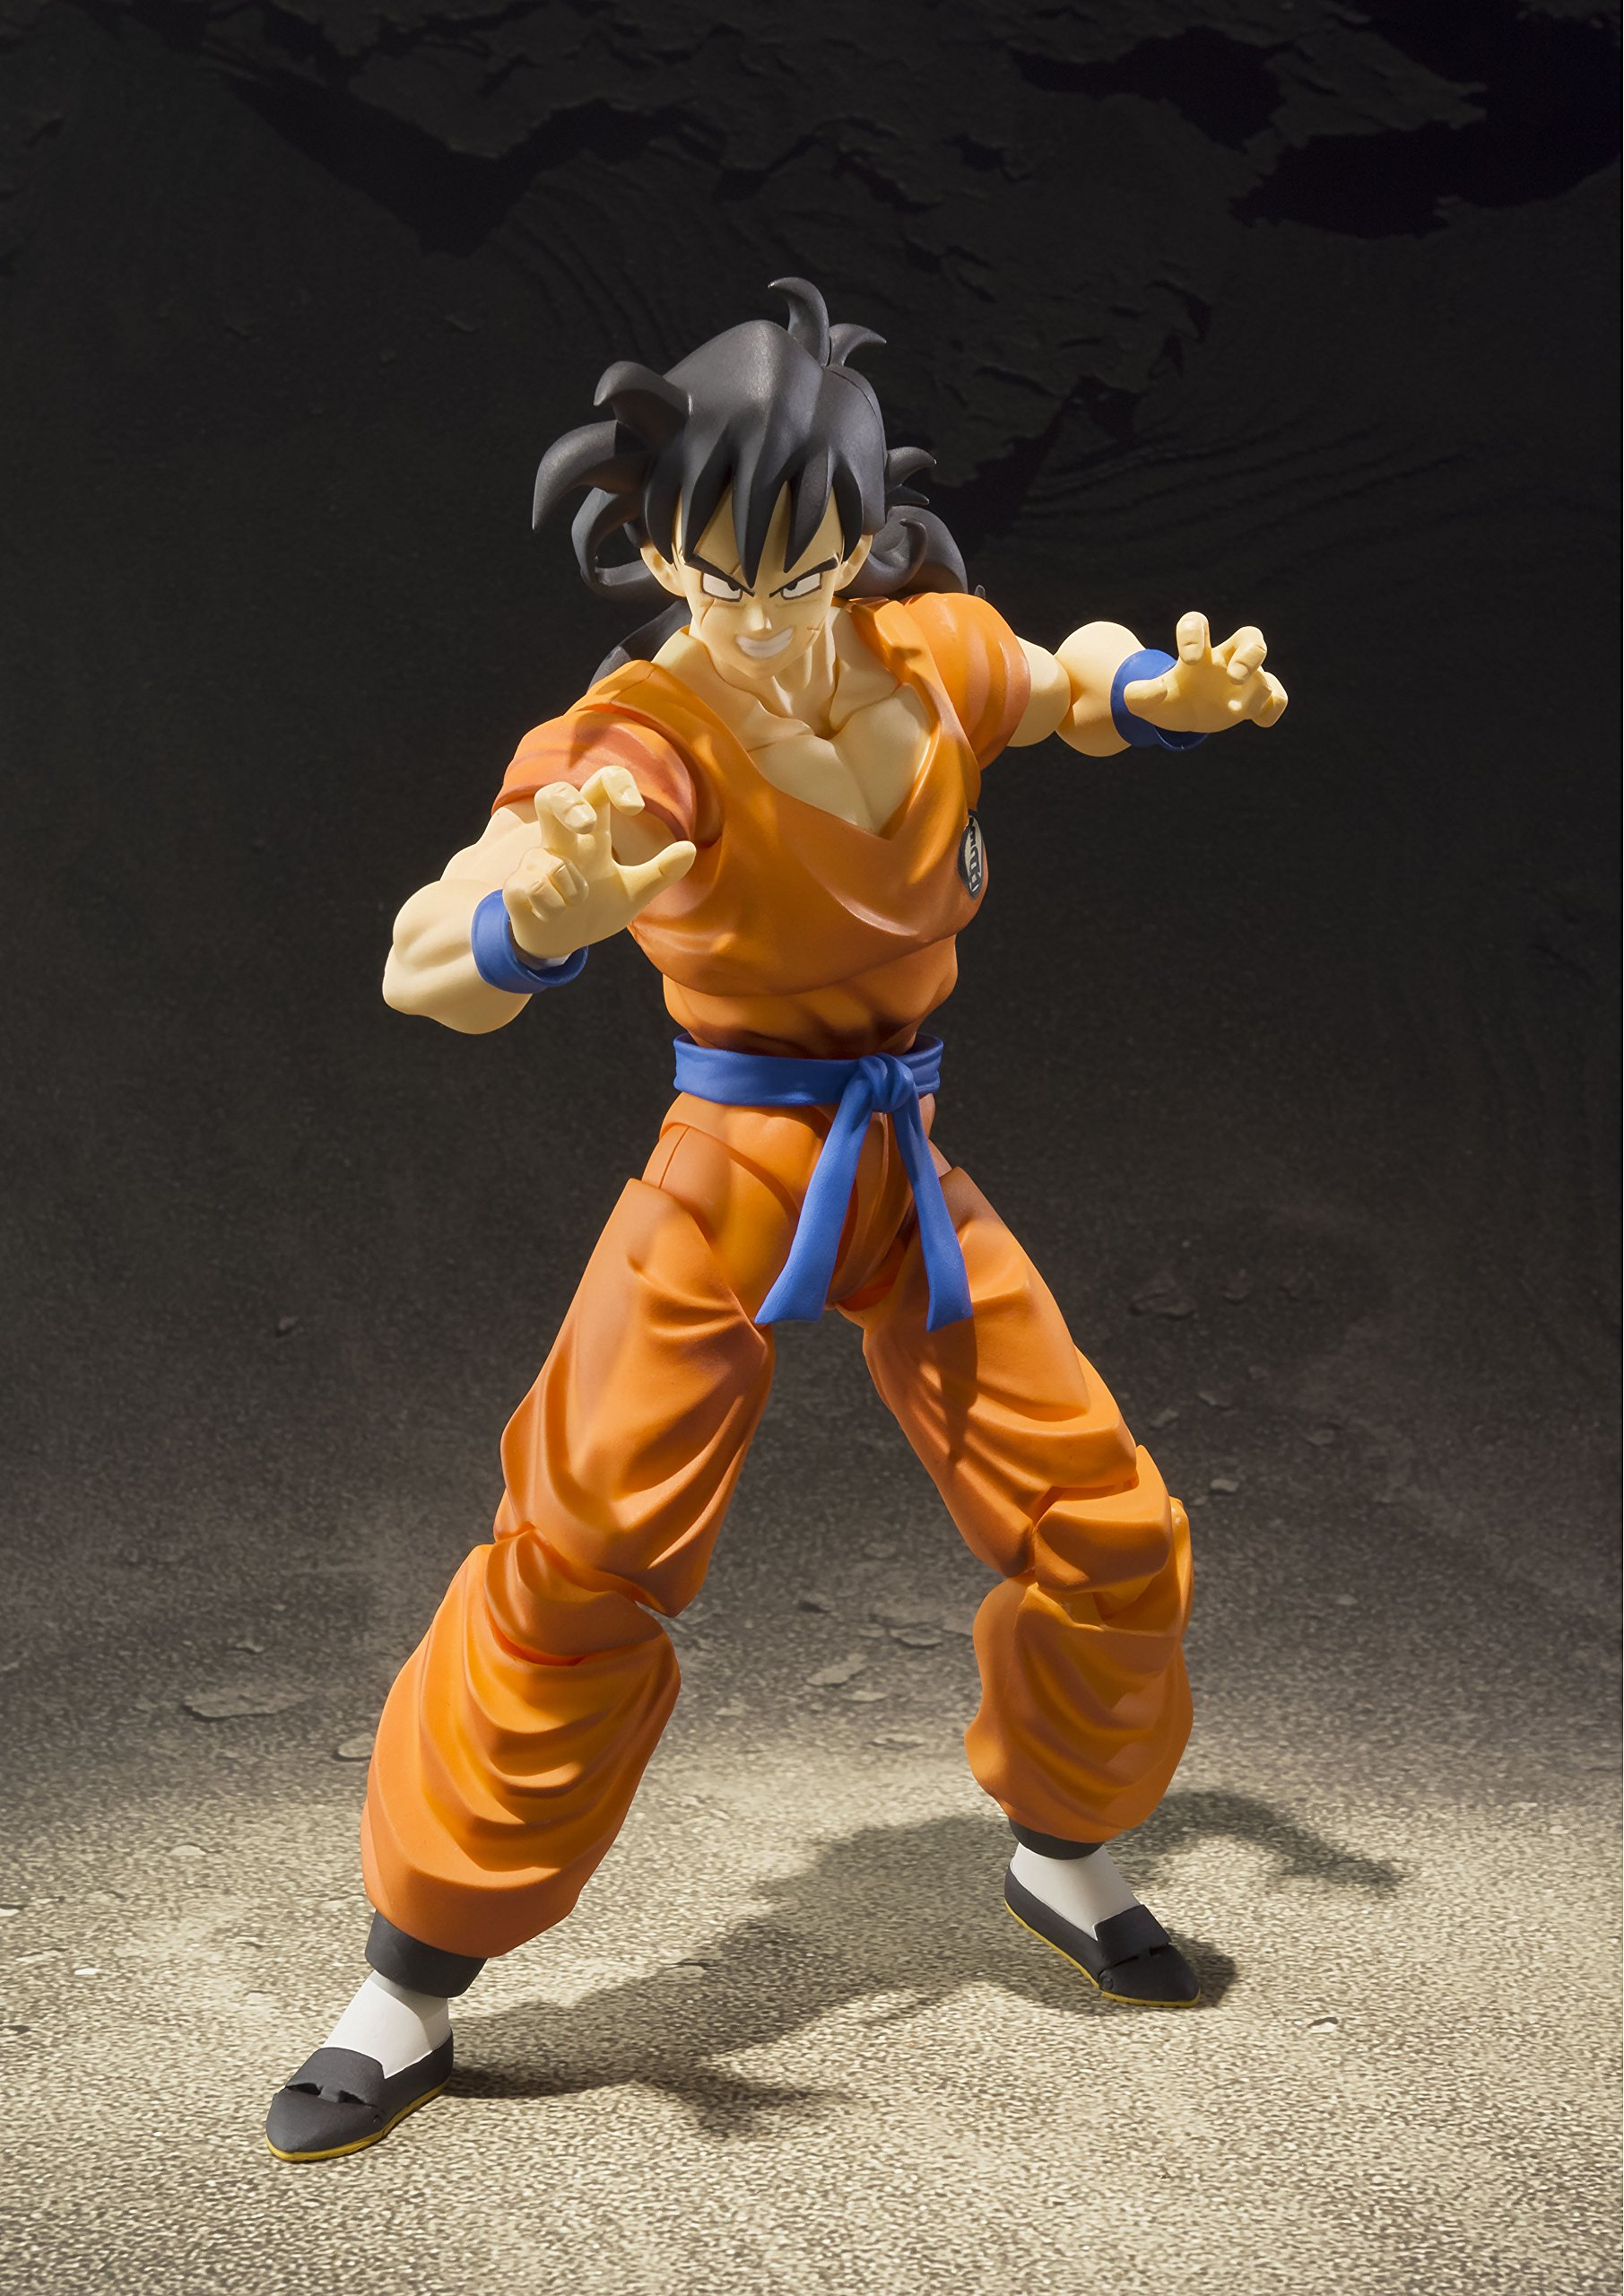 Anime Dragon Ball Z Figures Son Goku Yamcha Dead Action Figma Goku Super